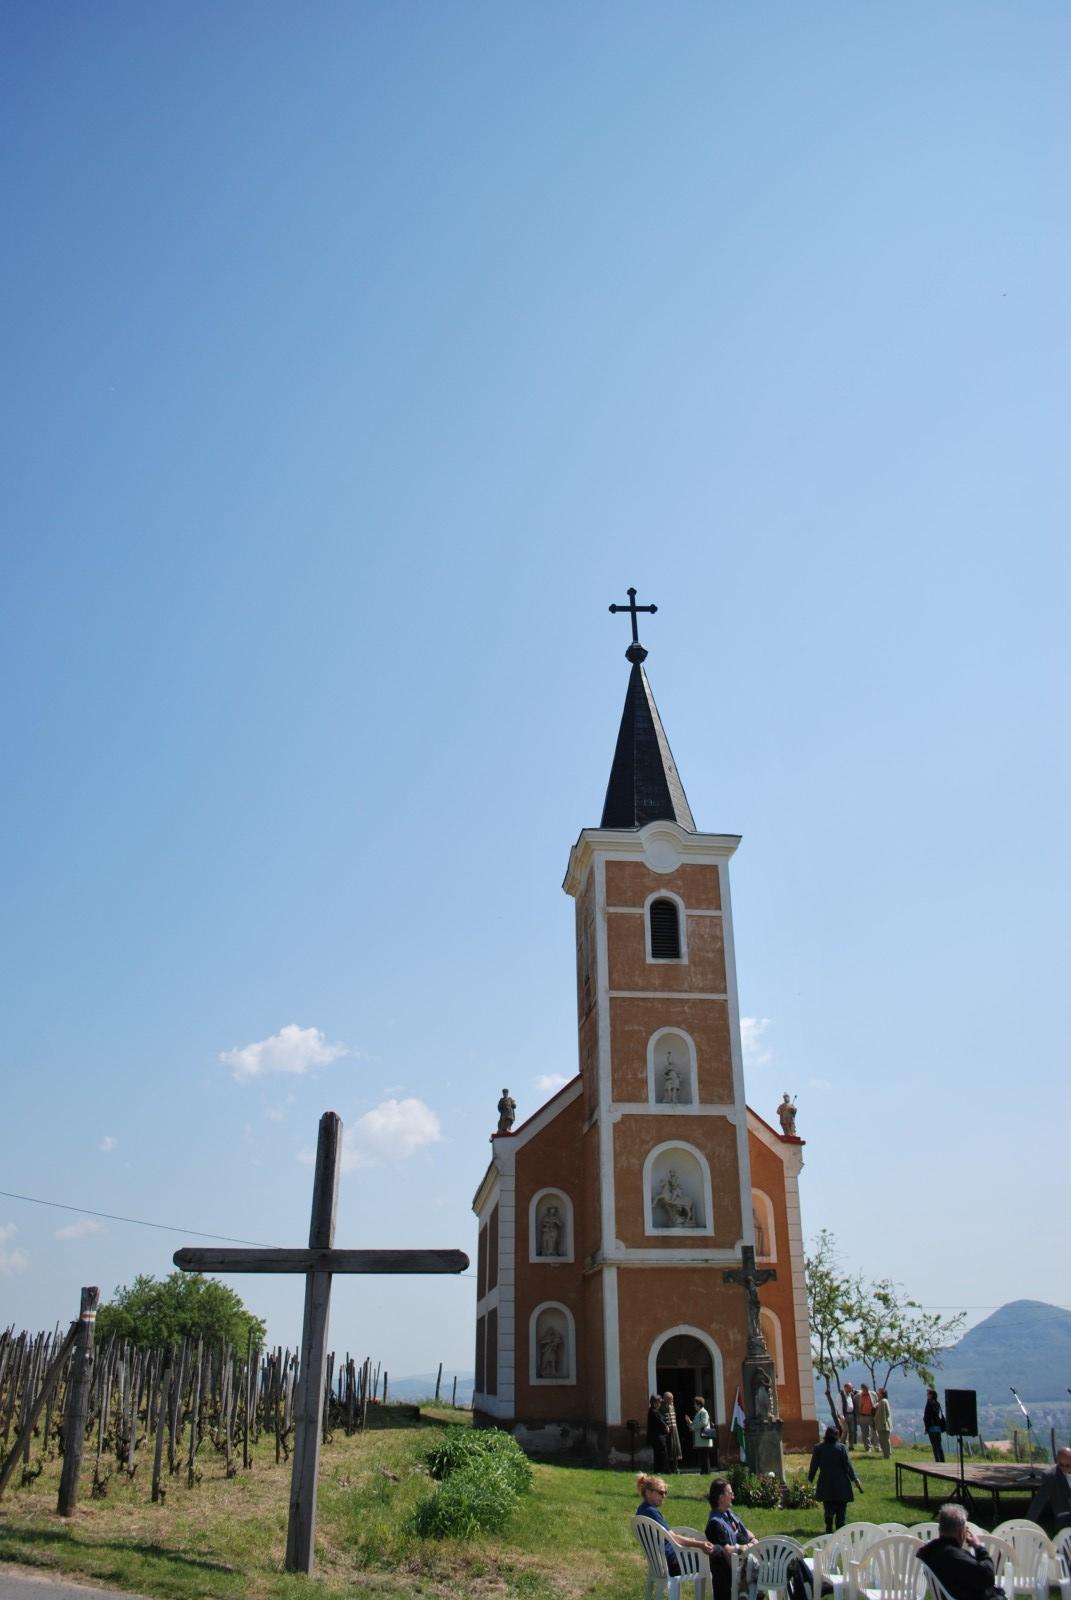 DSC 3733 lengyel kápolna